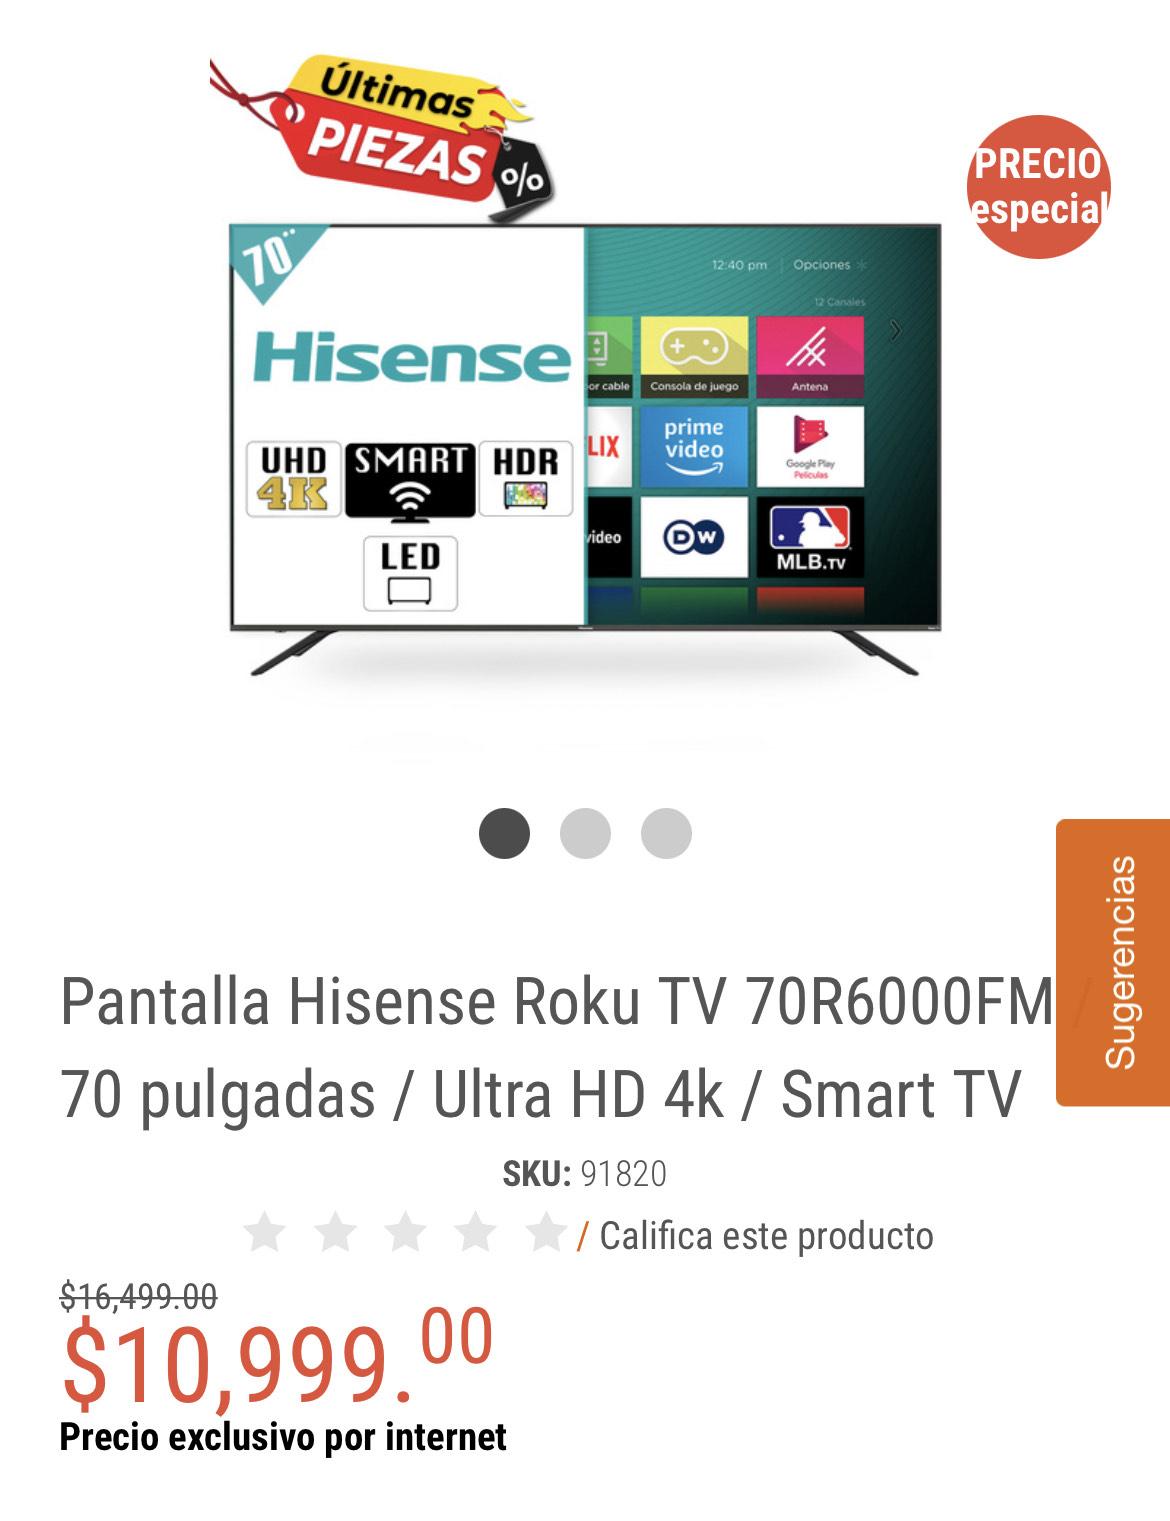 RadioShack: Pantalla Hisense Roku TV 70R6000FM / 70 pulgadas